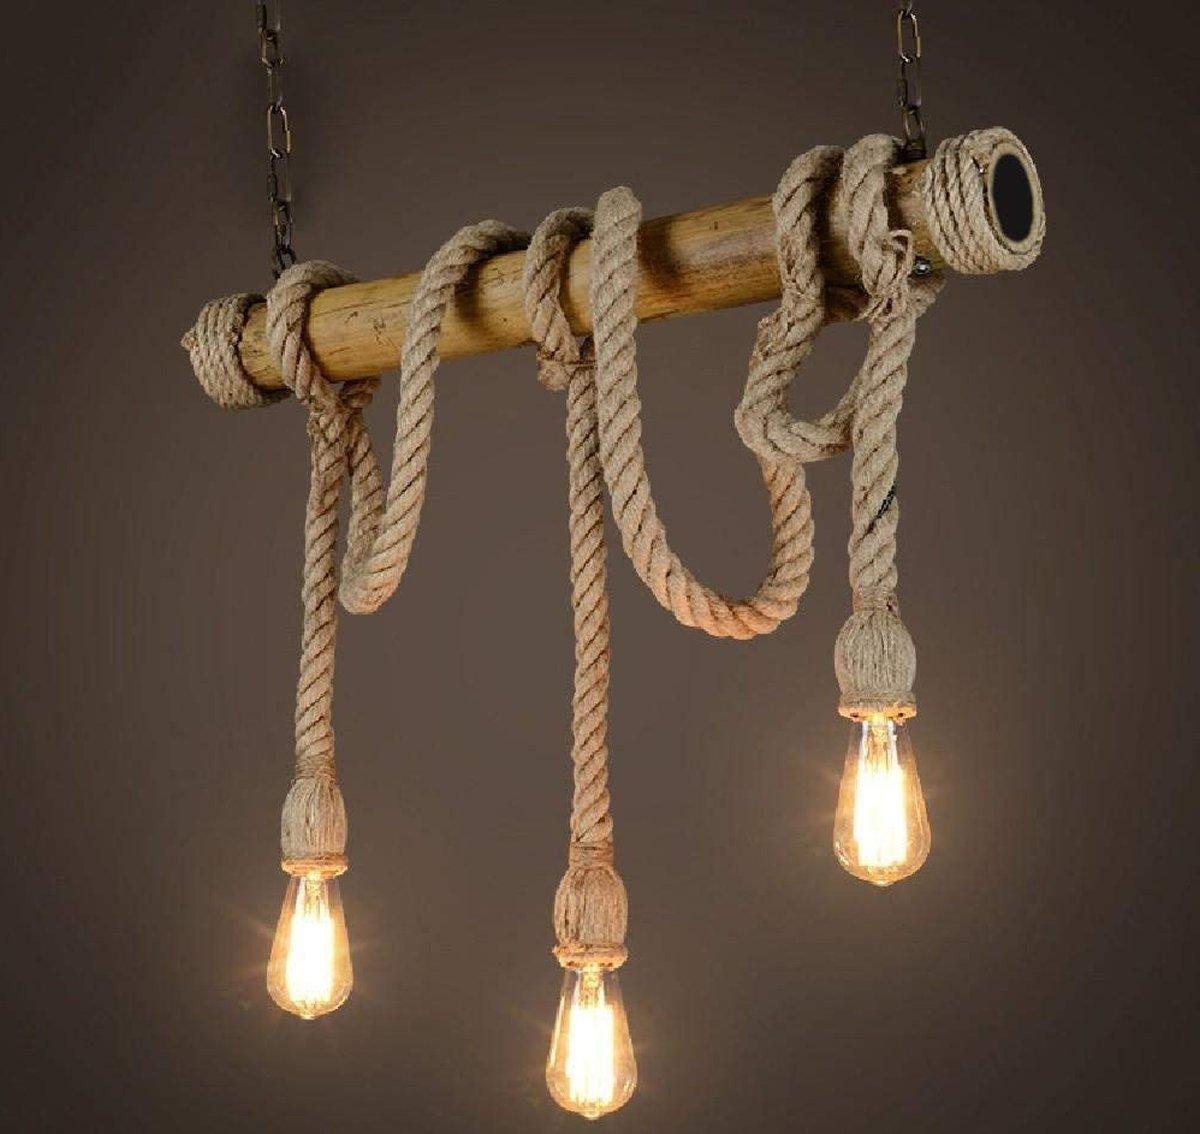 lampadario-a-ciondolo-in-corda-di-canapa-a-tre-teste-vintage-con-sostegno-base-bambu-legno